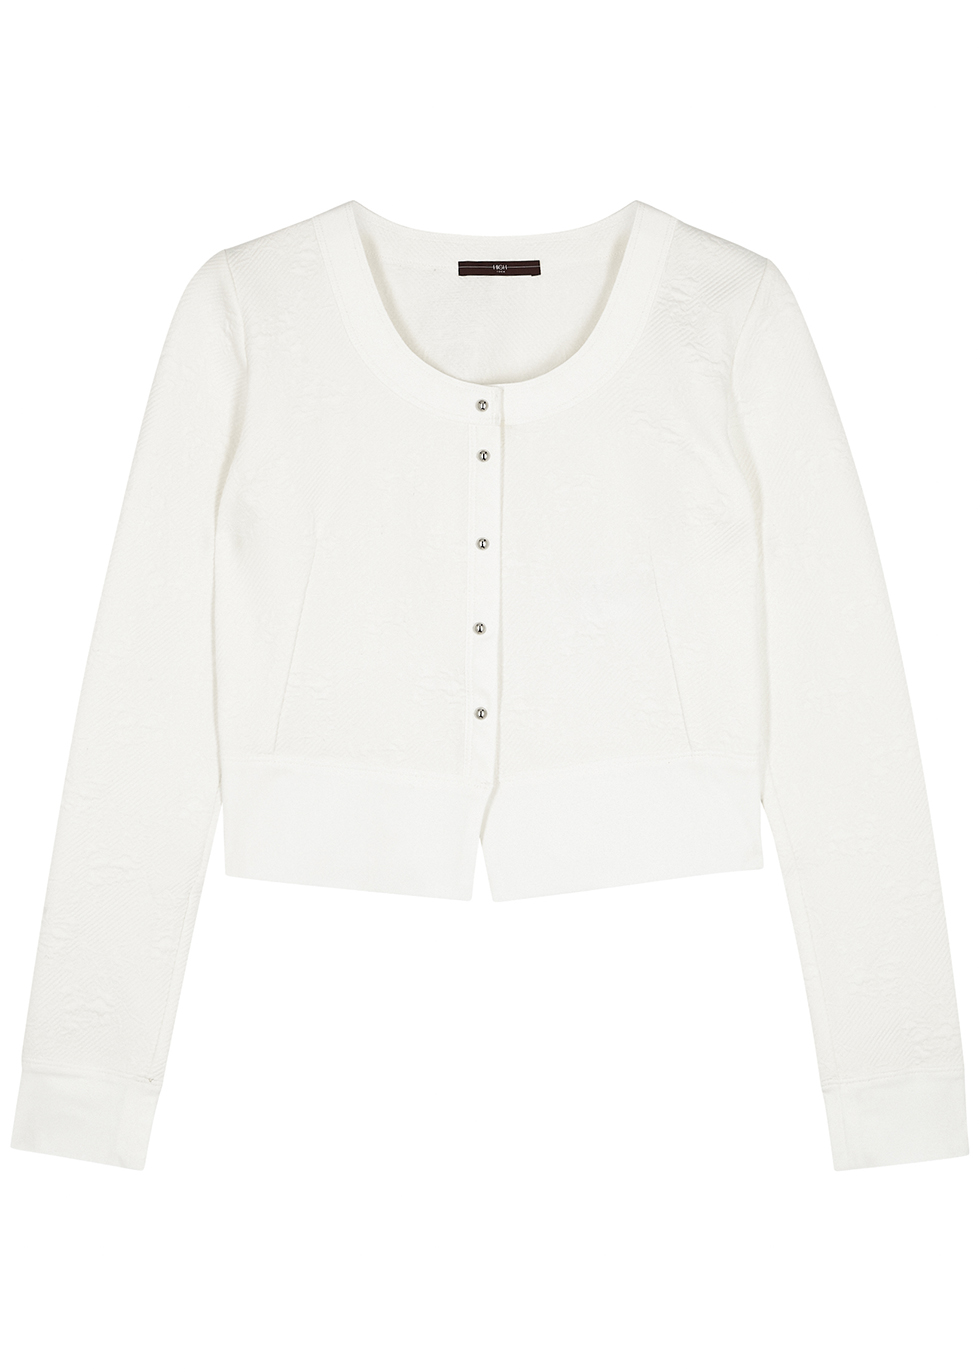 Imagine white stretch-knit cardigan